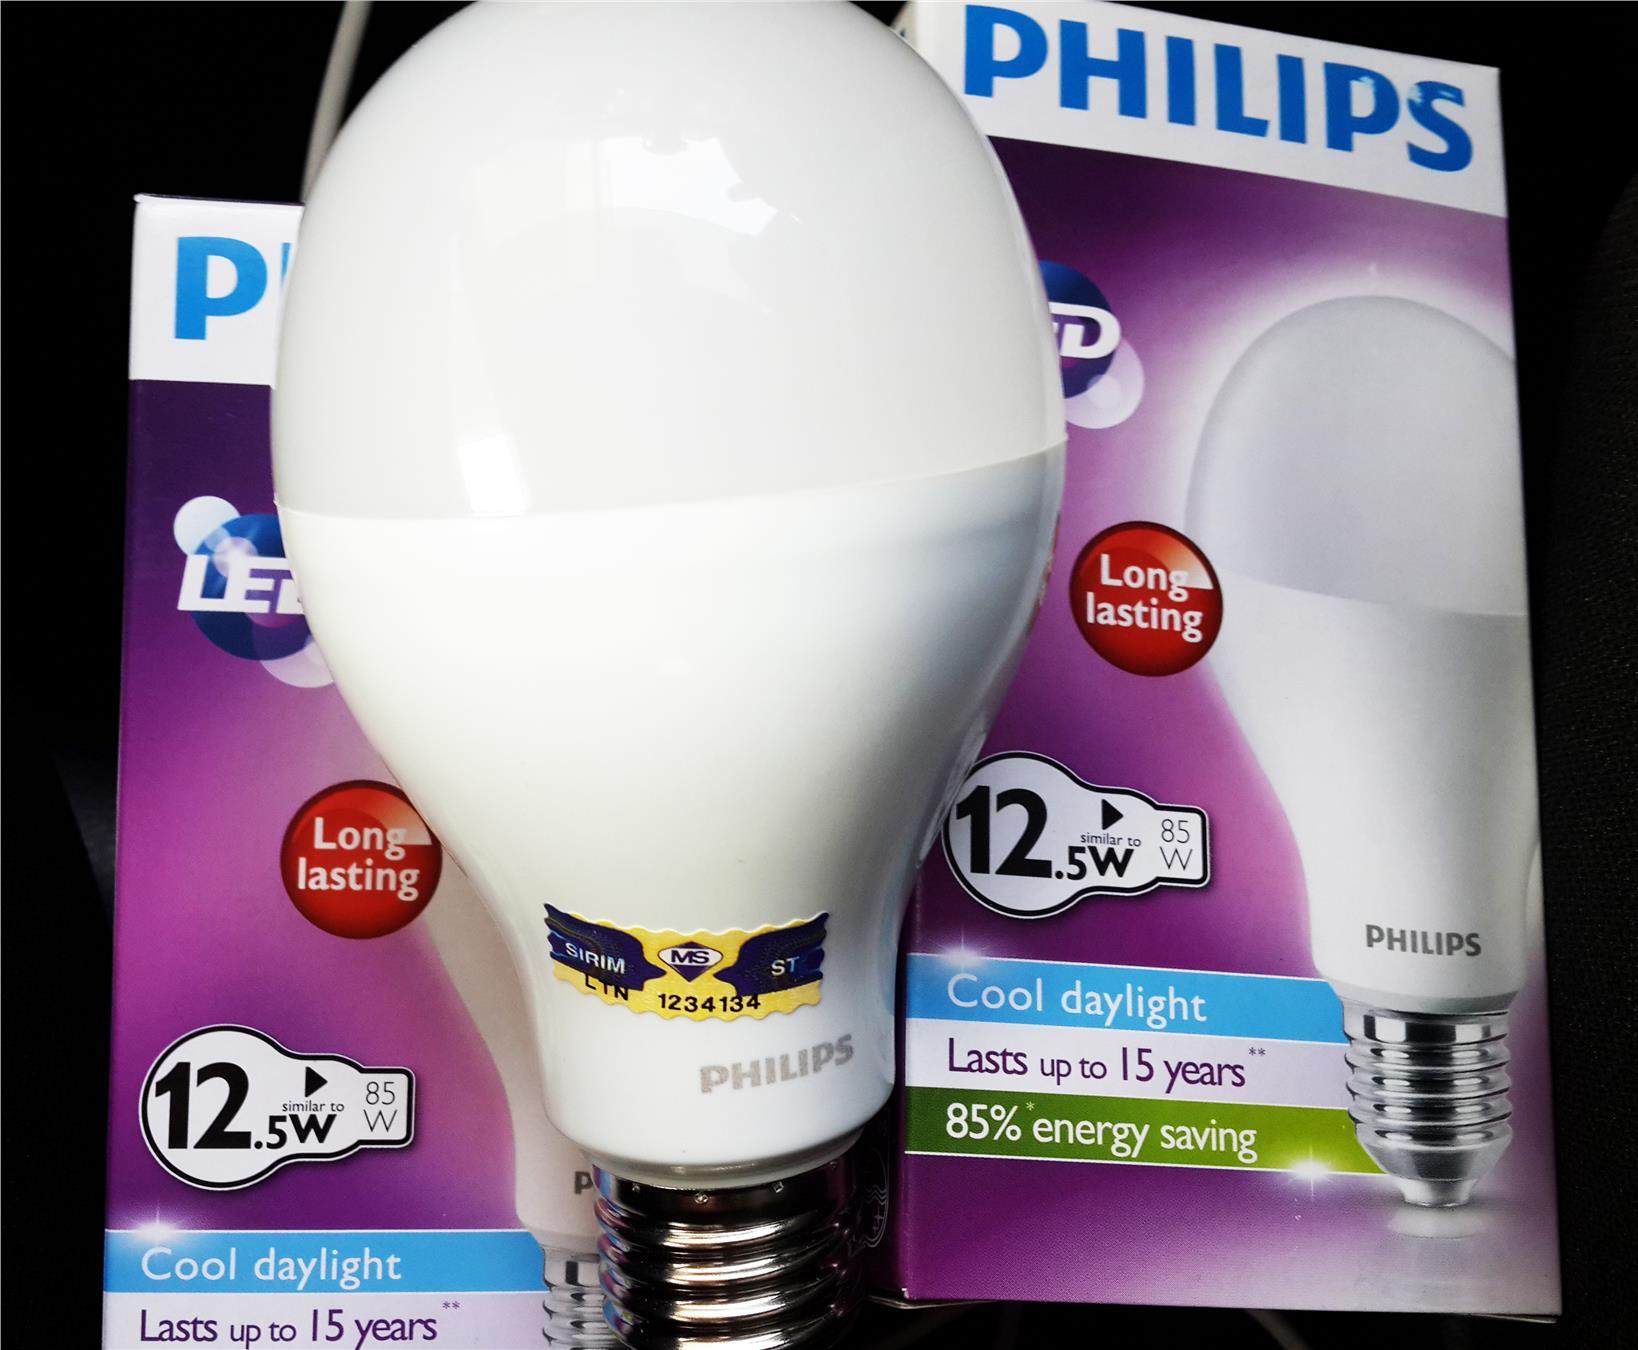 philips e27 led bulb end 4 22 2019 12 15 pm. Black Bedroom Furniture Sets. Home Design Ideas